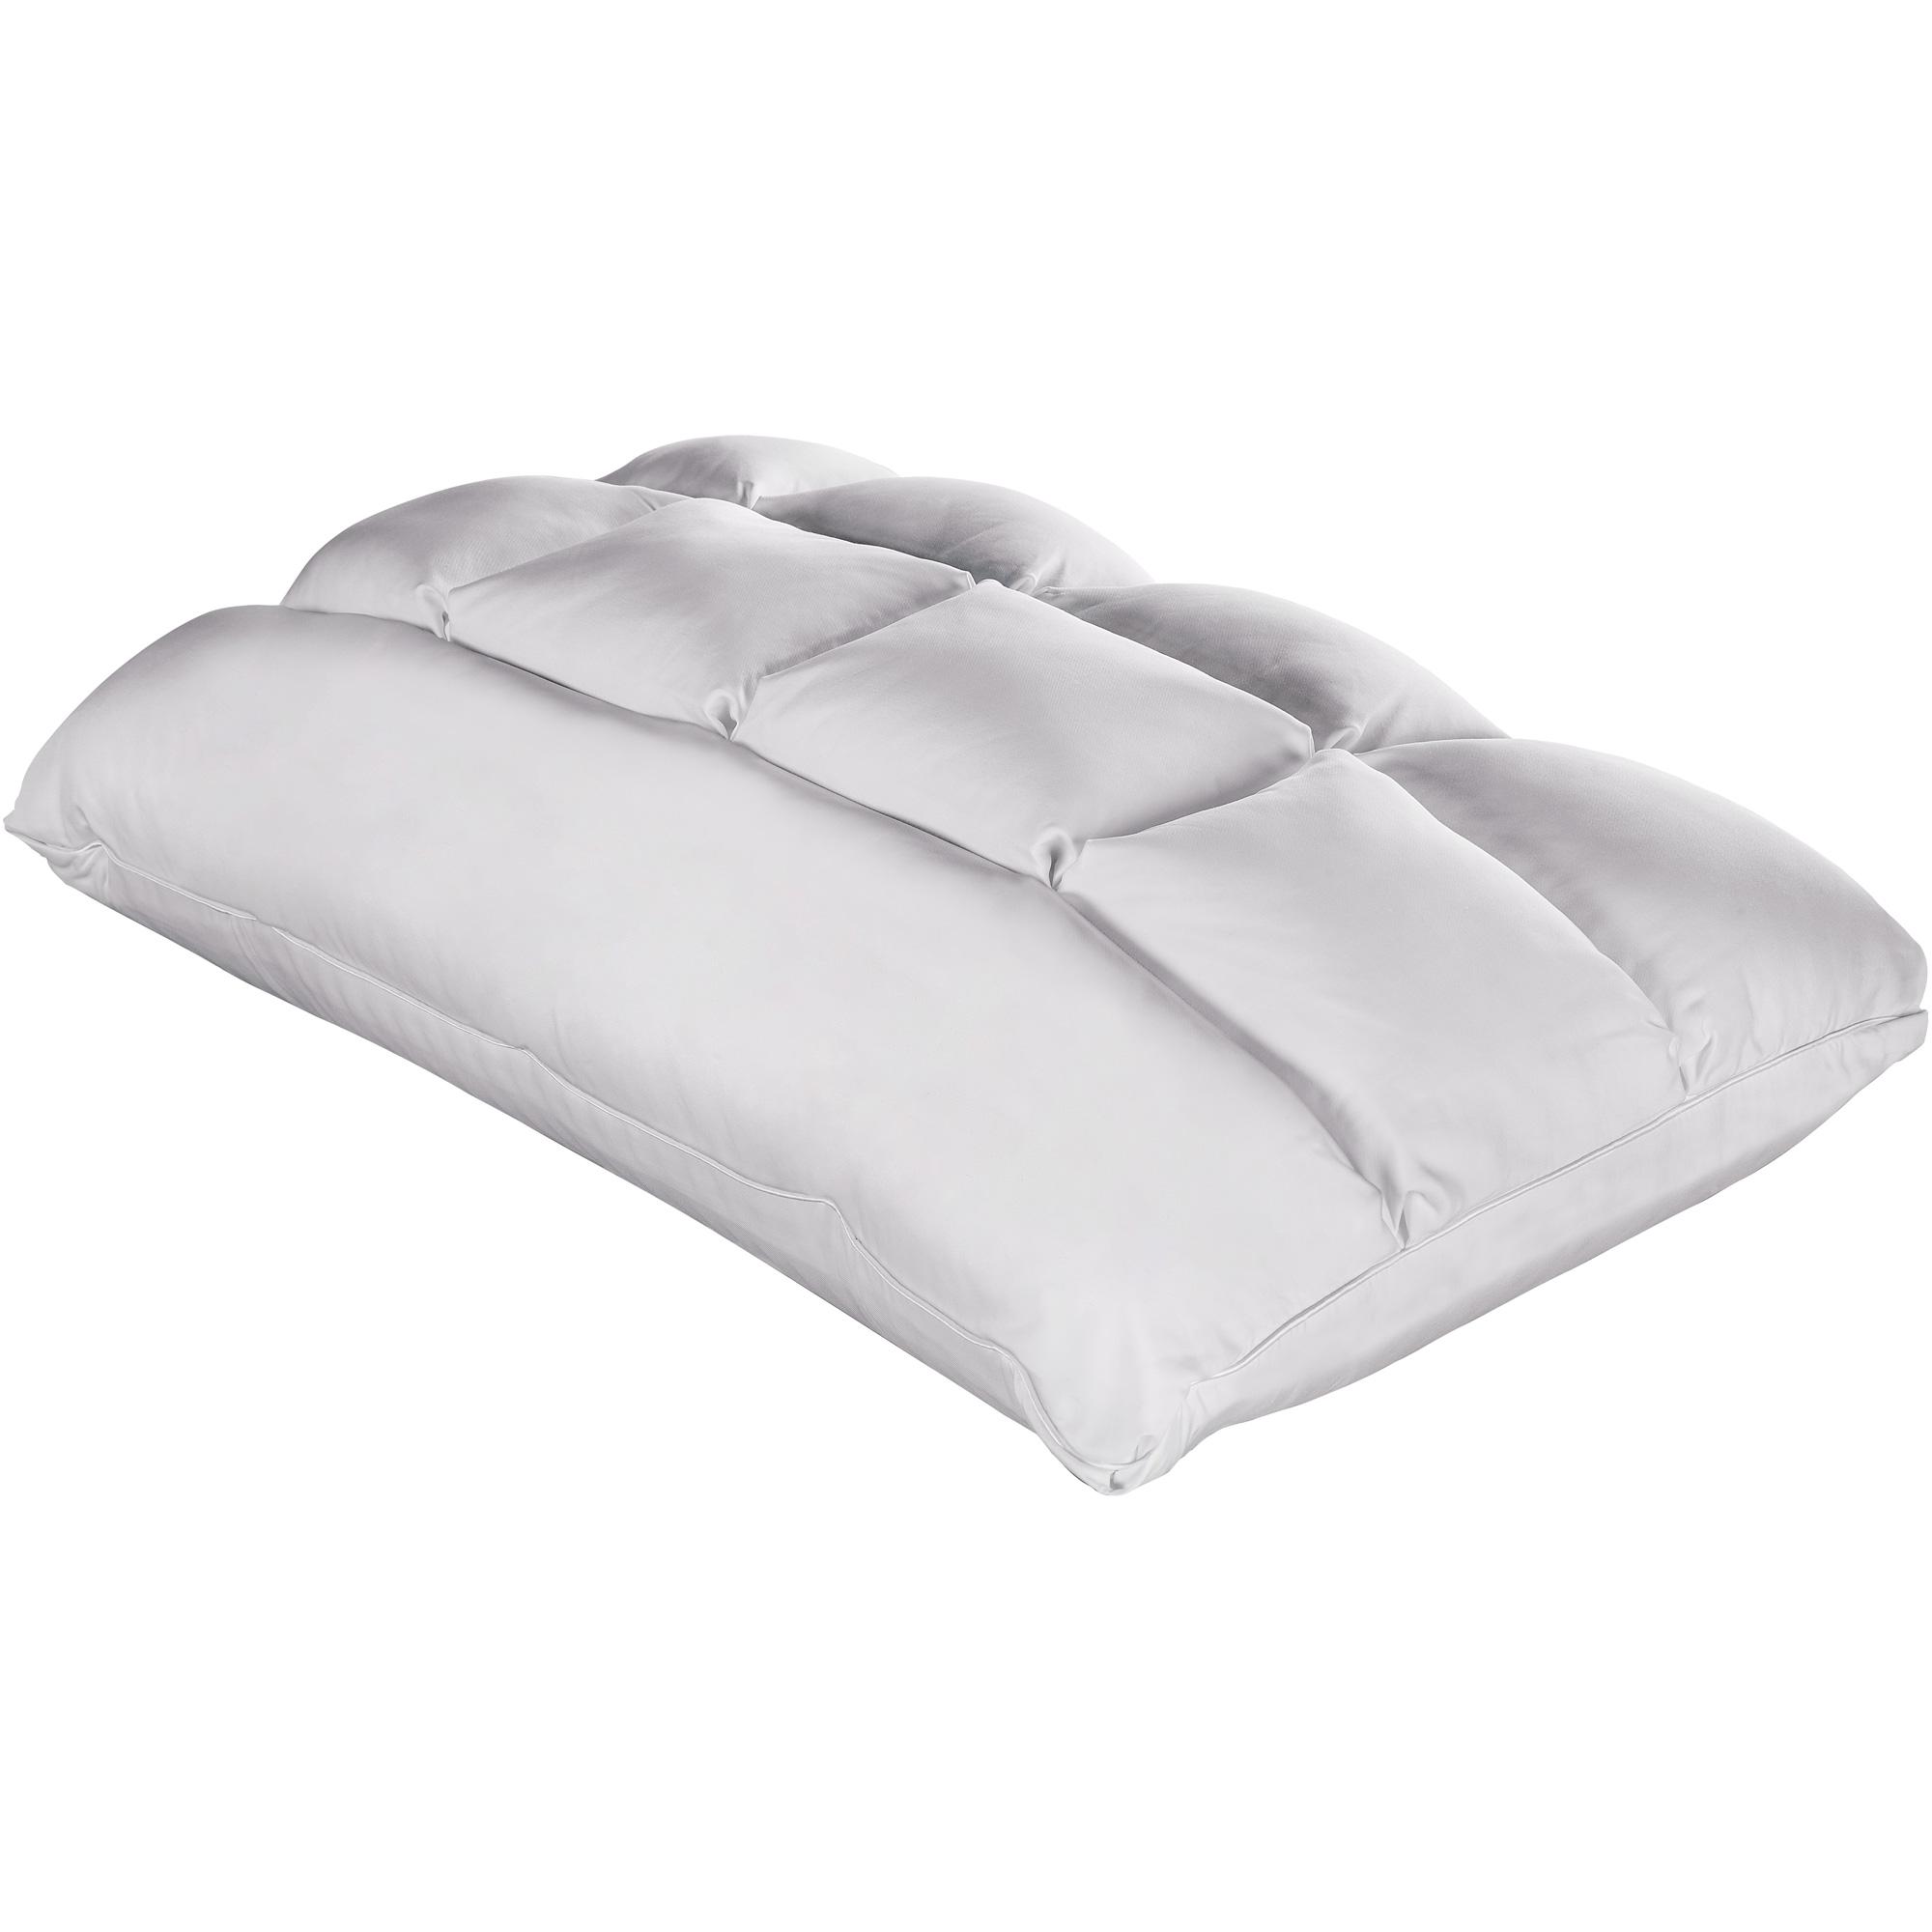 Shop Slumberland Furniture Bed Pillows